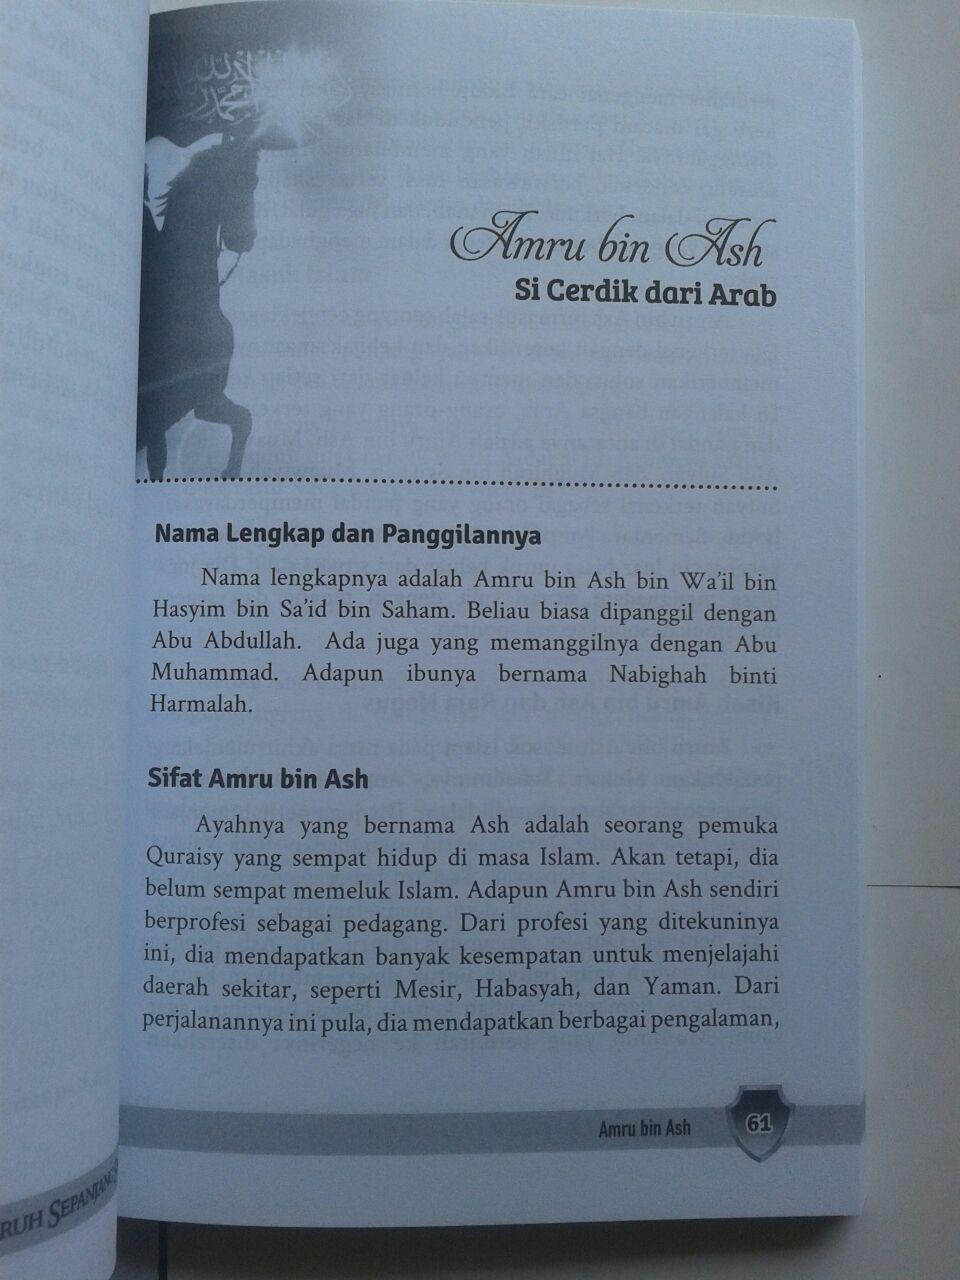 Buku Jenderal Islam Paling Berpengaruh Sepanjang Sejarah isi 2